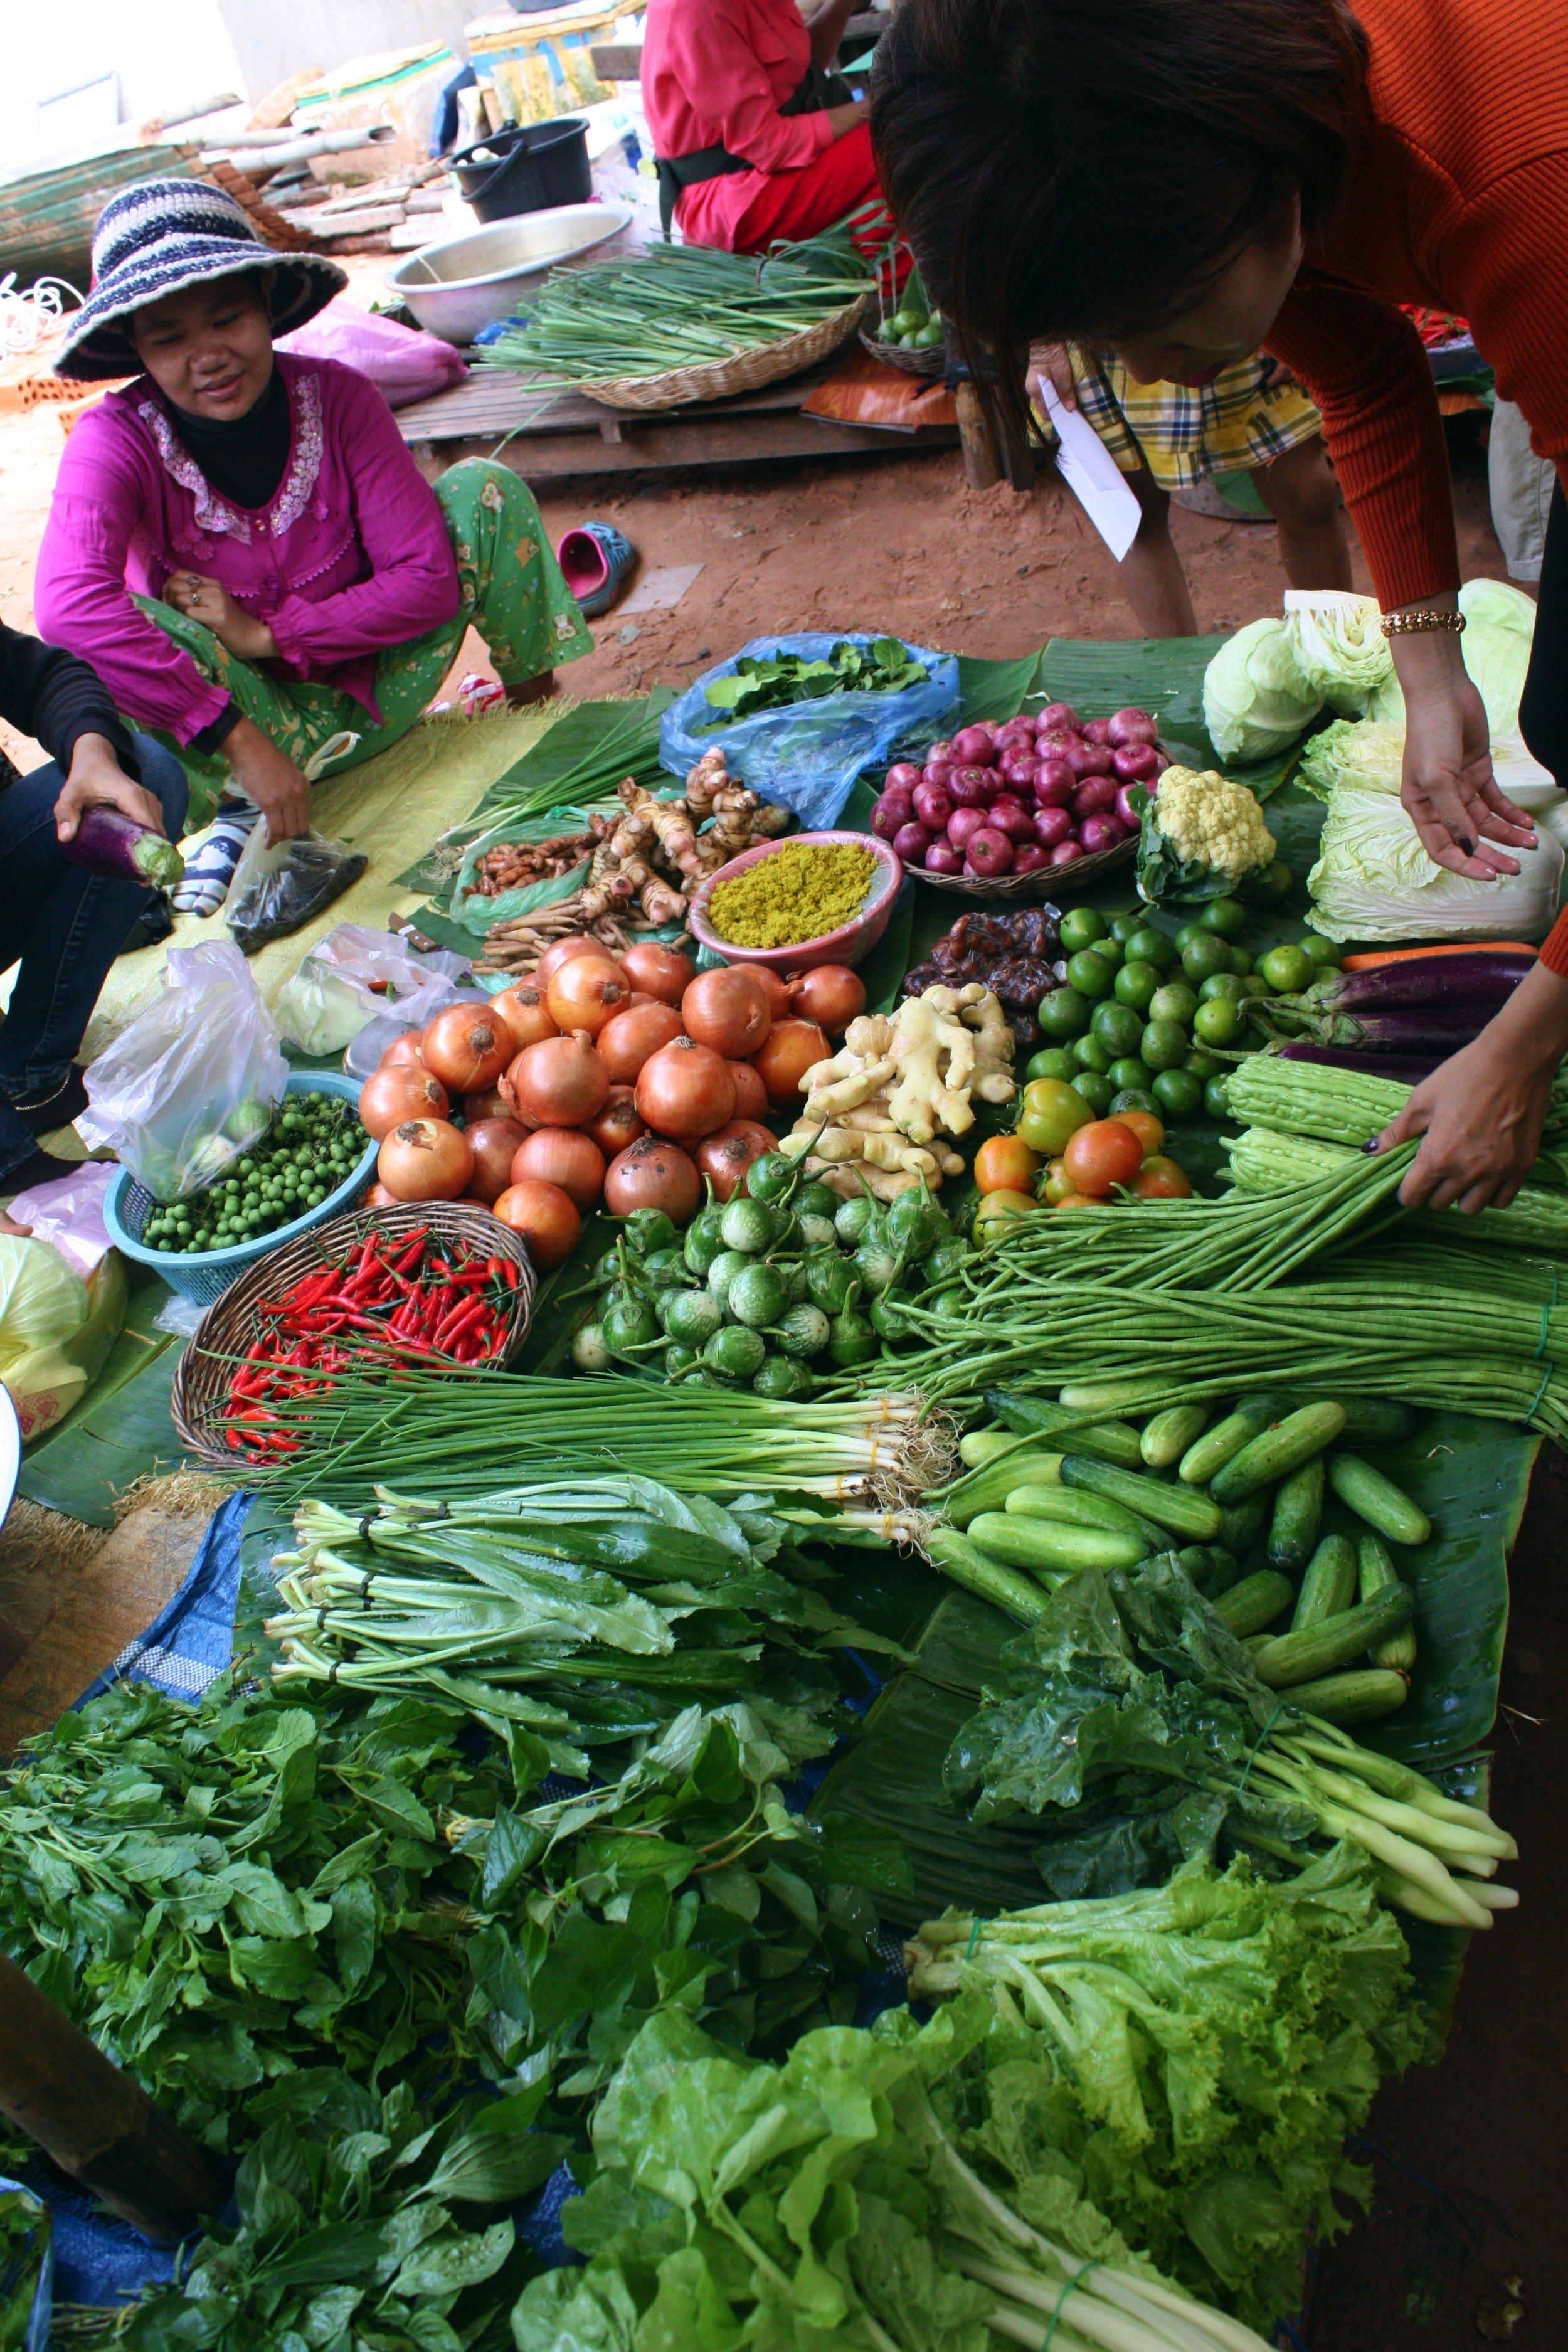 Morning market visit near Sela's.